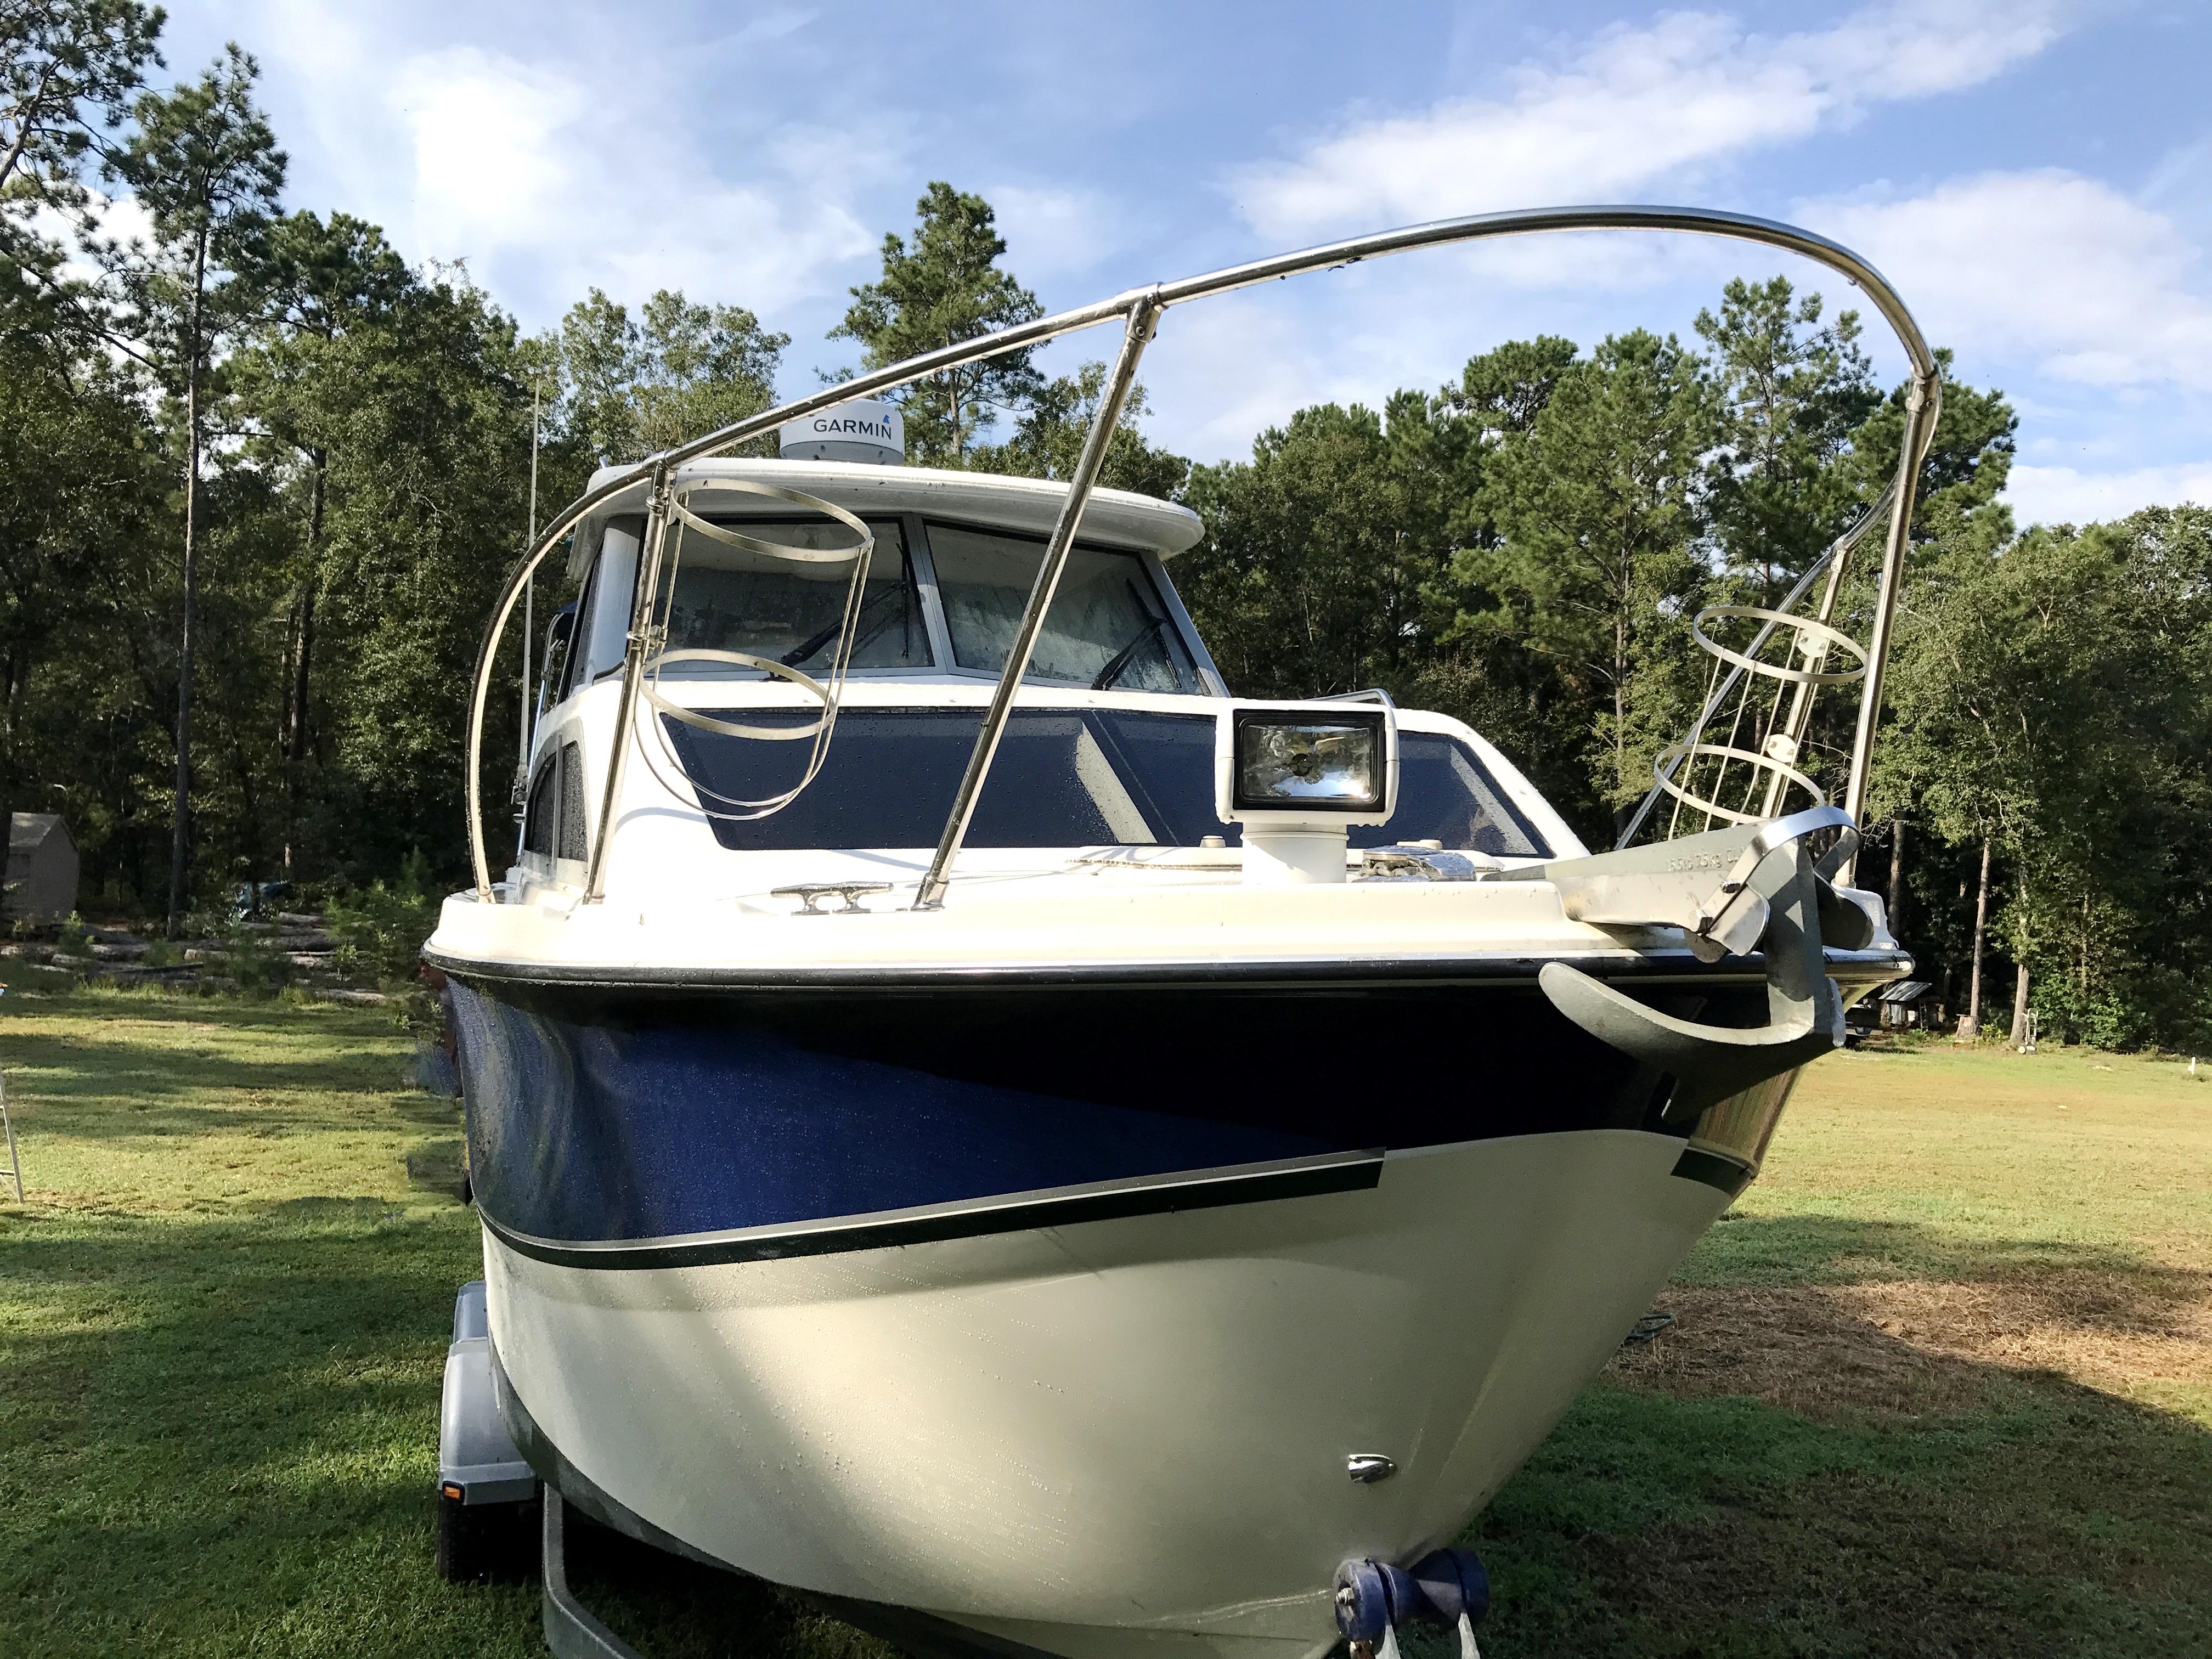 Bayliner Discovery 246 EC - bow rails, spot light, anchor, fender holders